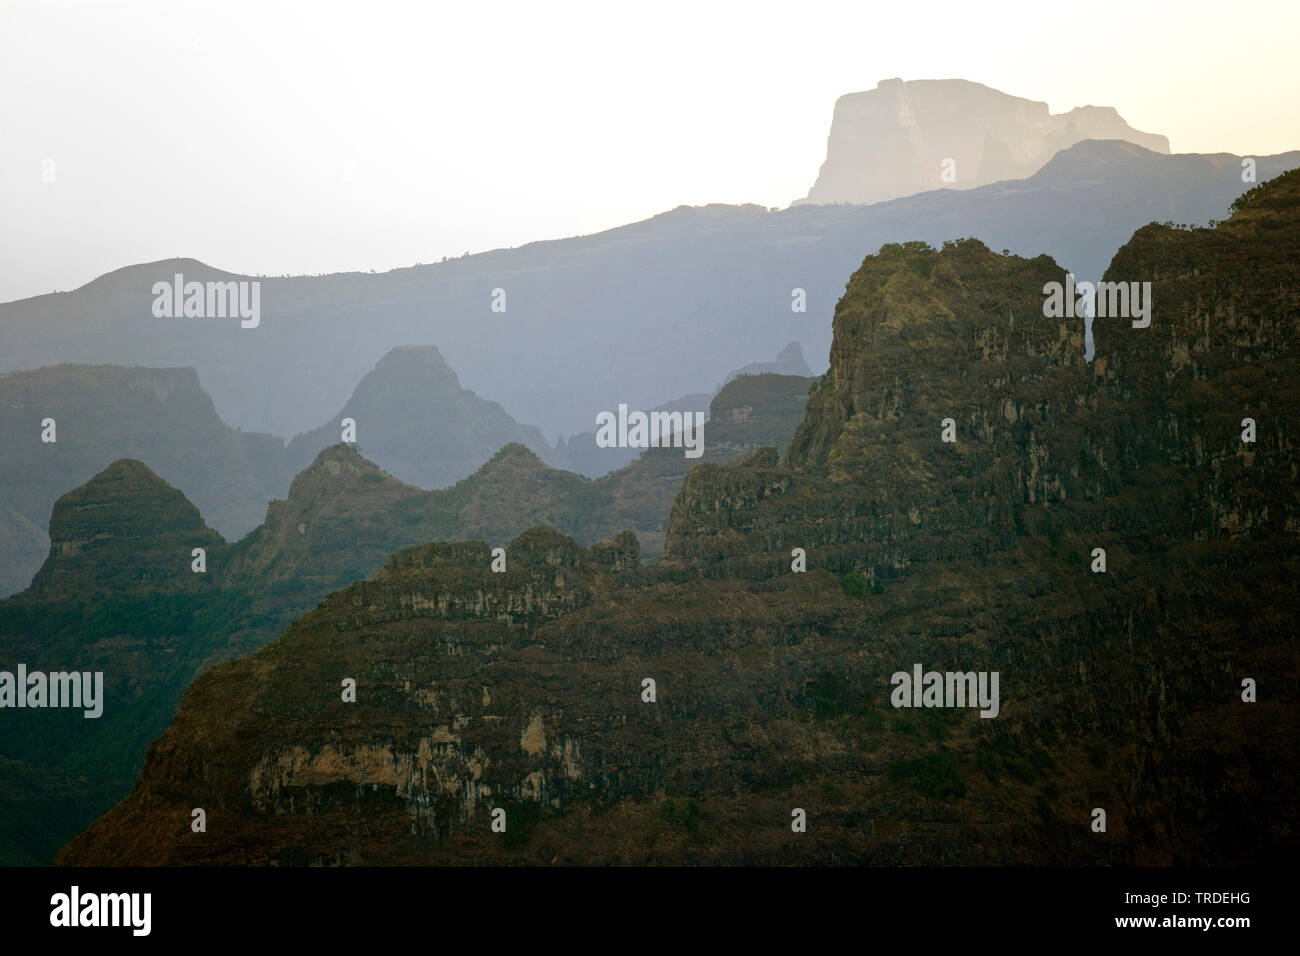 Simien-Berge im Abendlicht, Aethiopien, Simien Mountains Nationalpark   Simien Mountains in evening light, Ethiopia, Simien Mountains National Park   - Stock Image